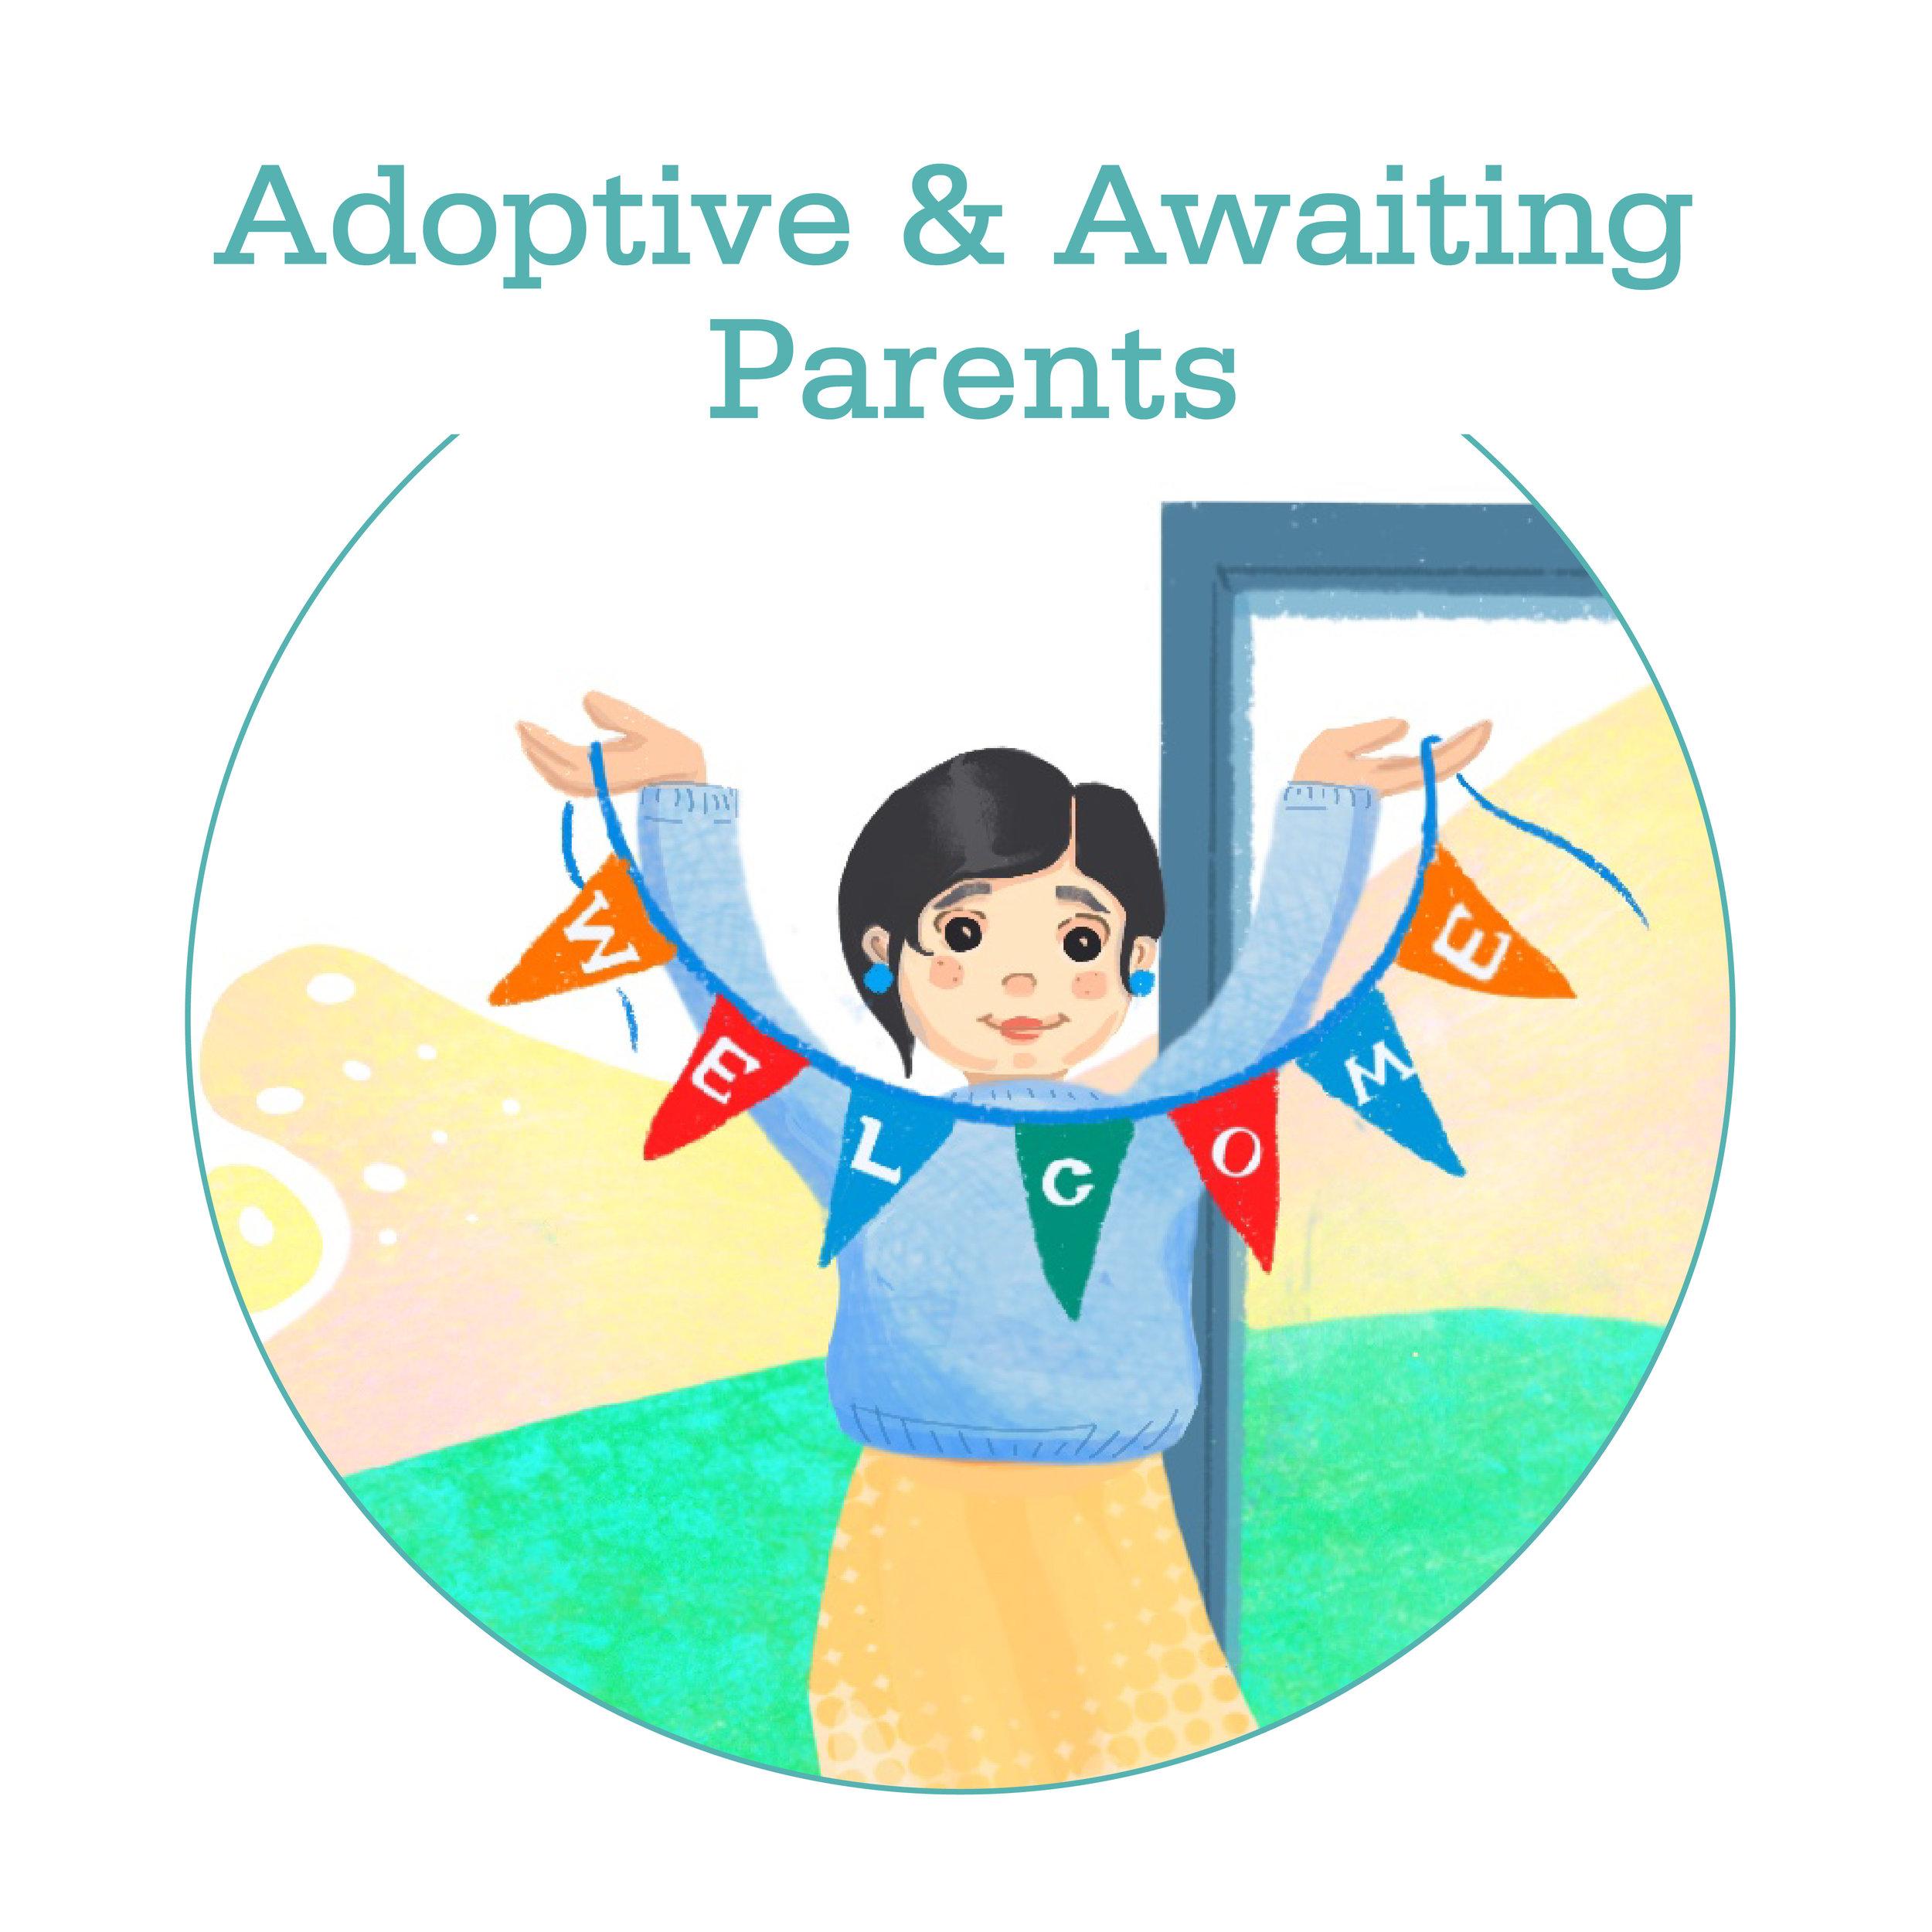 web_adopt_await.jpg